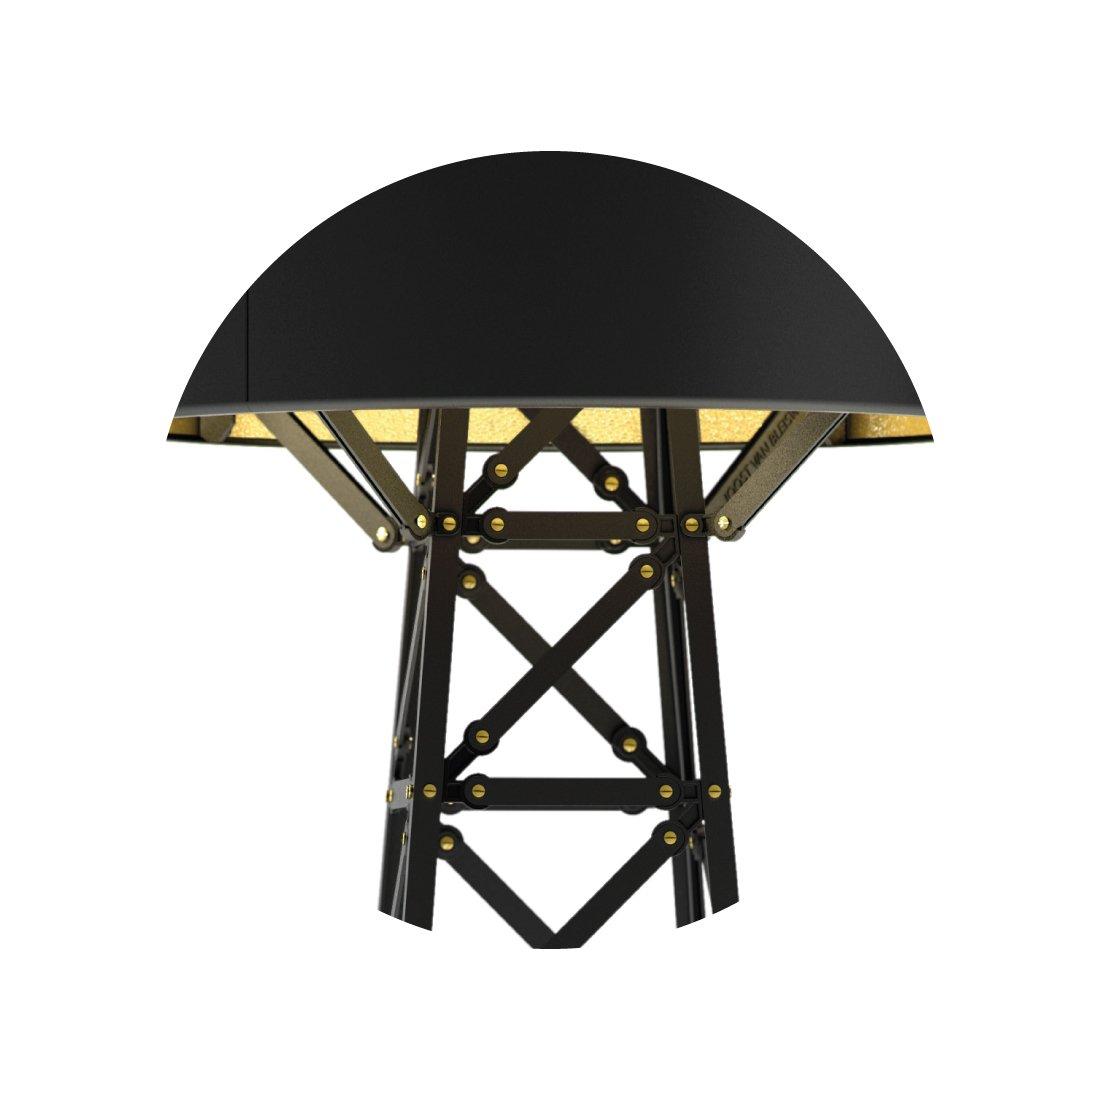 Moooi Construction Vloerlamp Zwart M